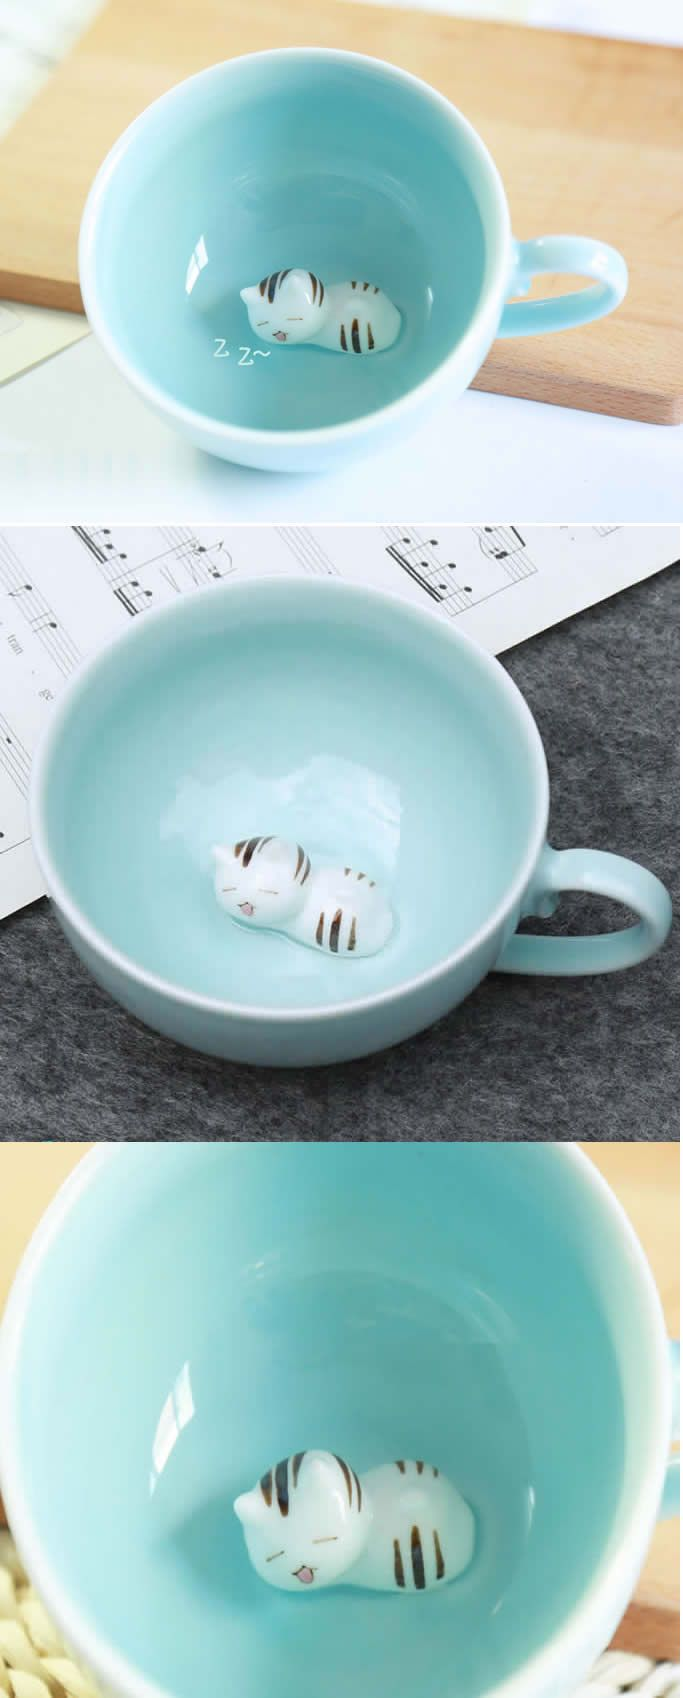 cute cat figurine ceramic coffee cup novelty mugs pinterest